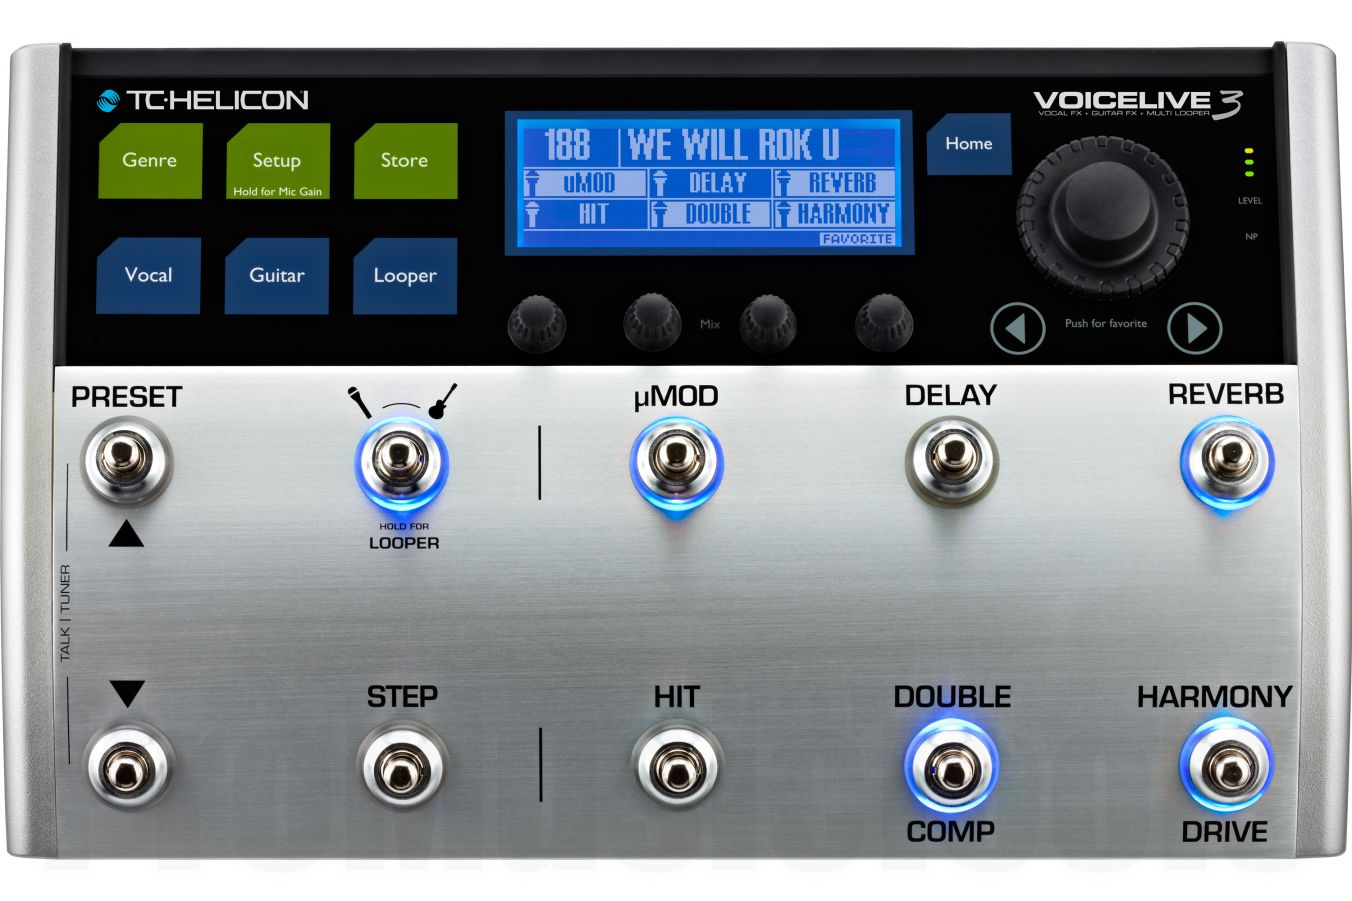 TC Helicon VoiceLive 3